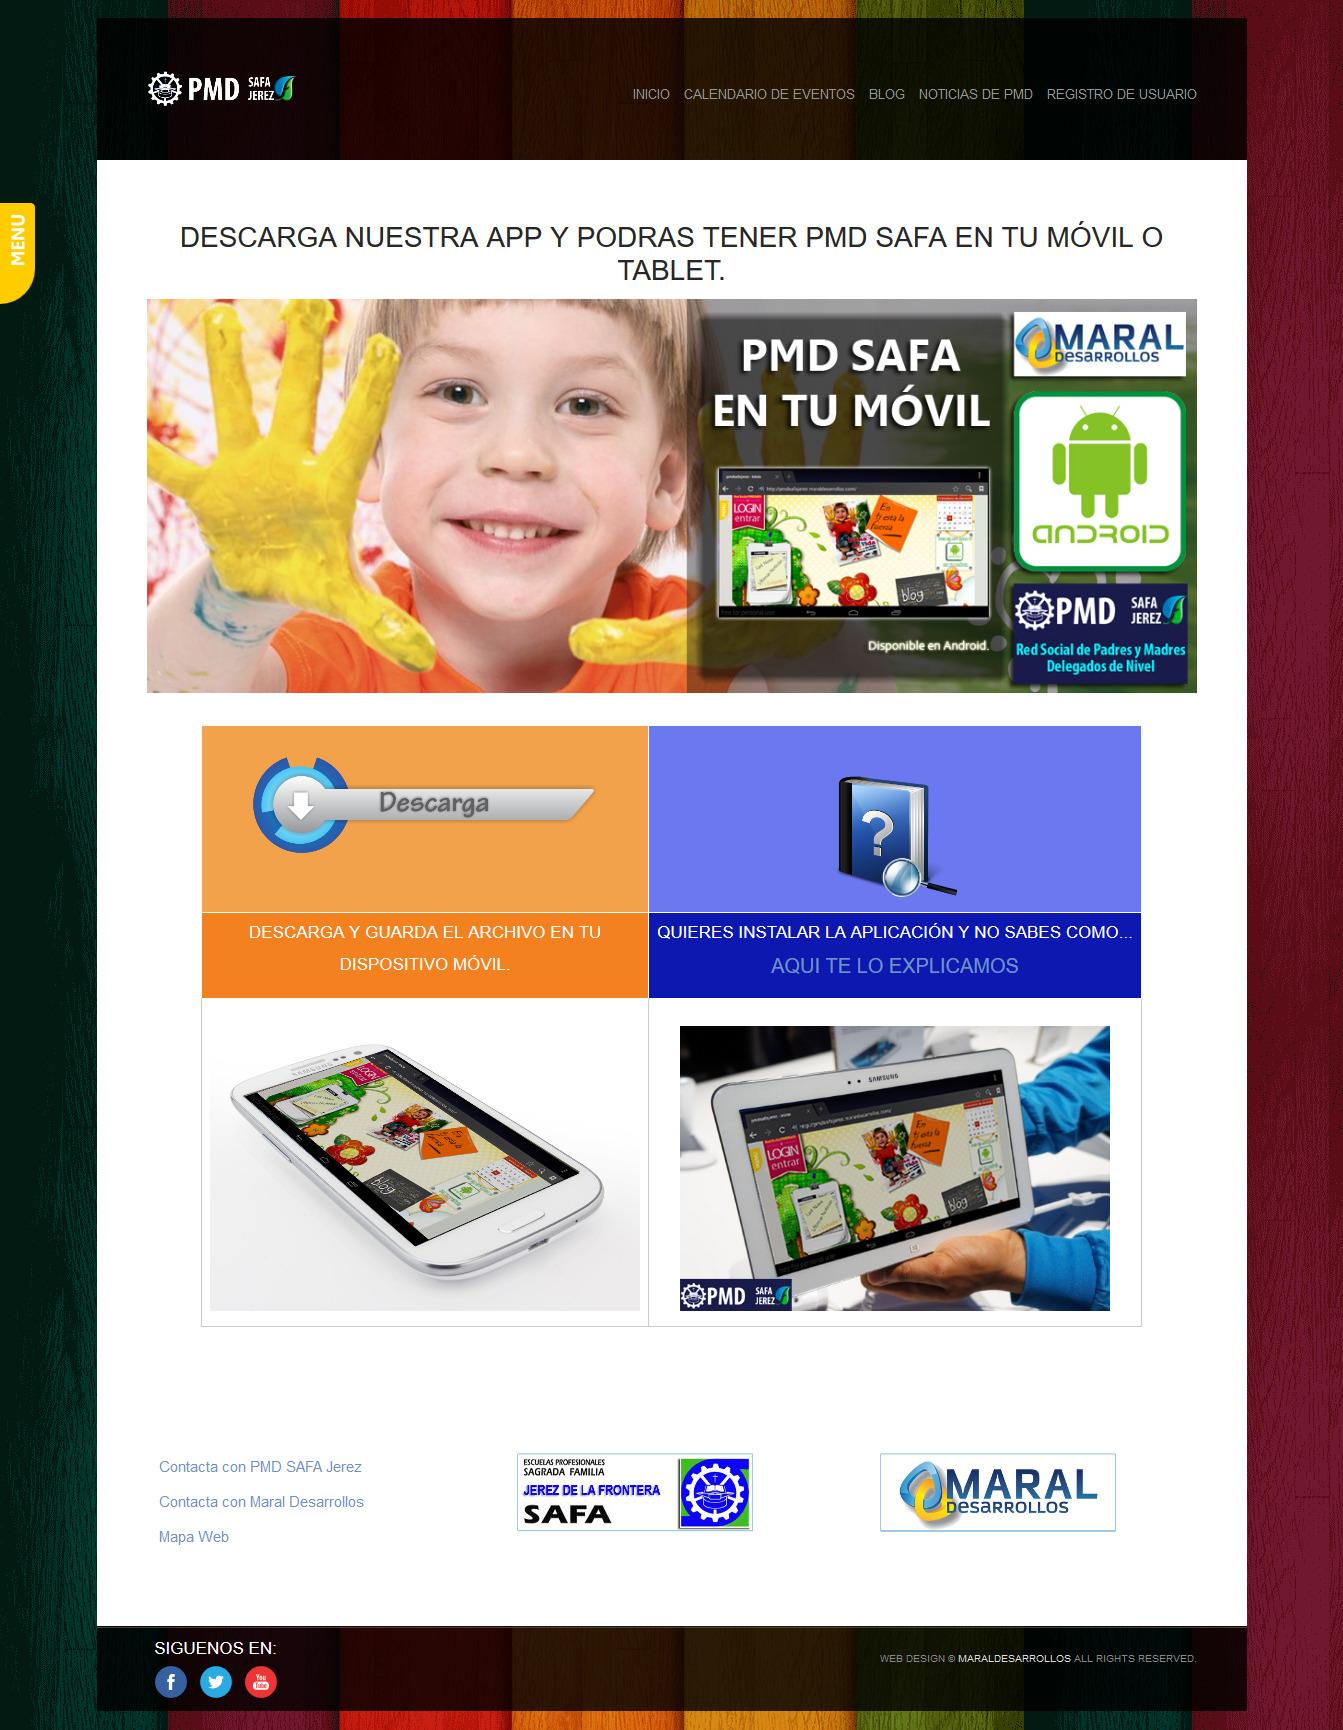 005-safa-web-app